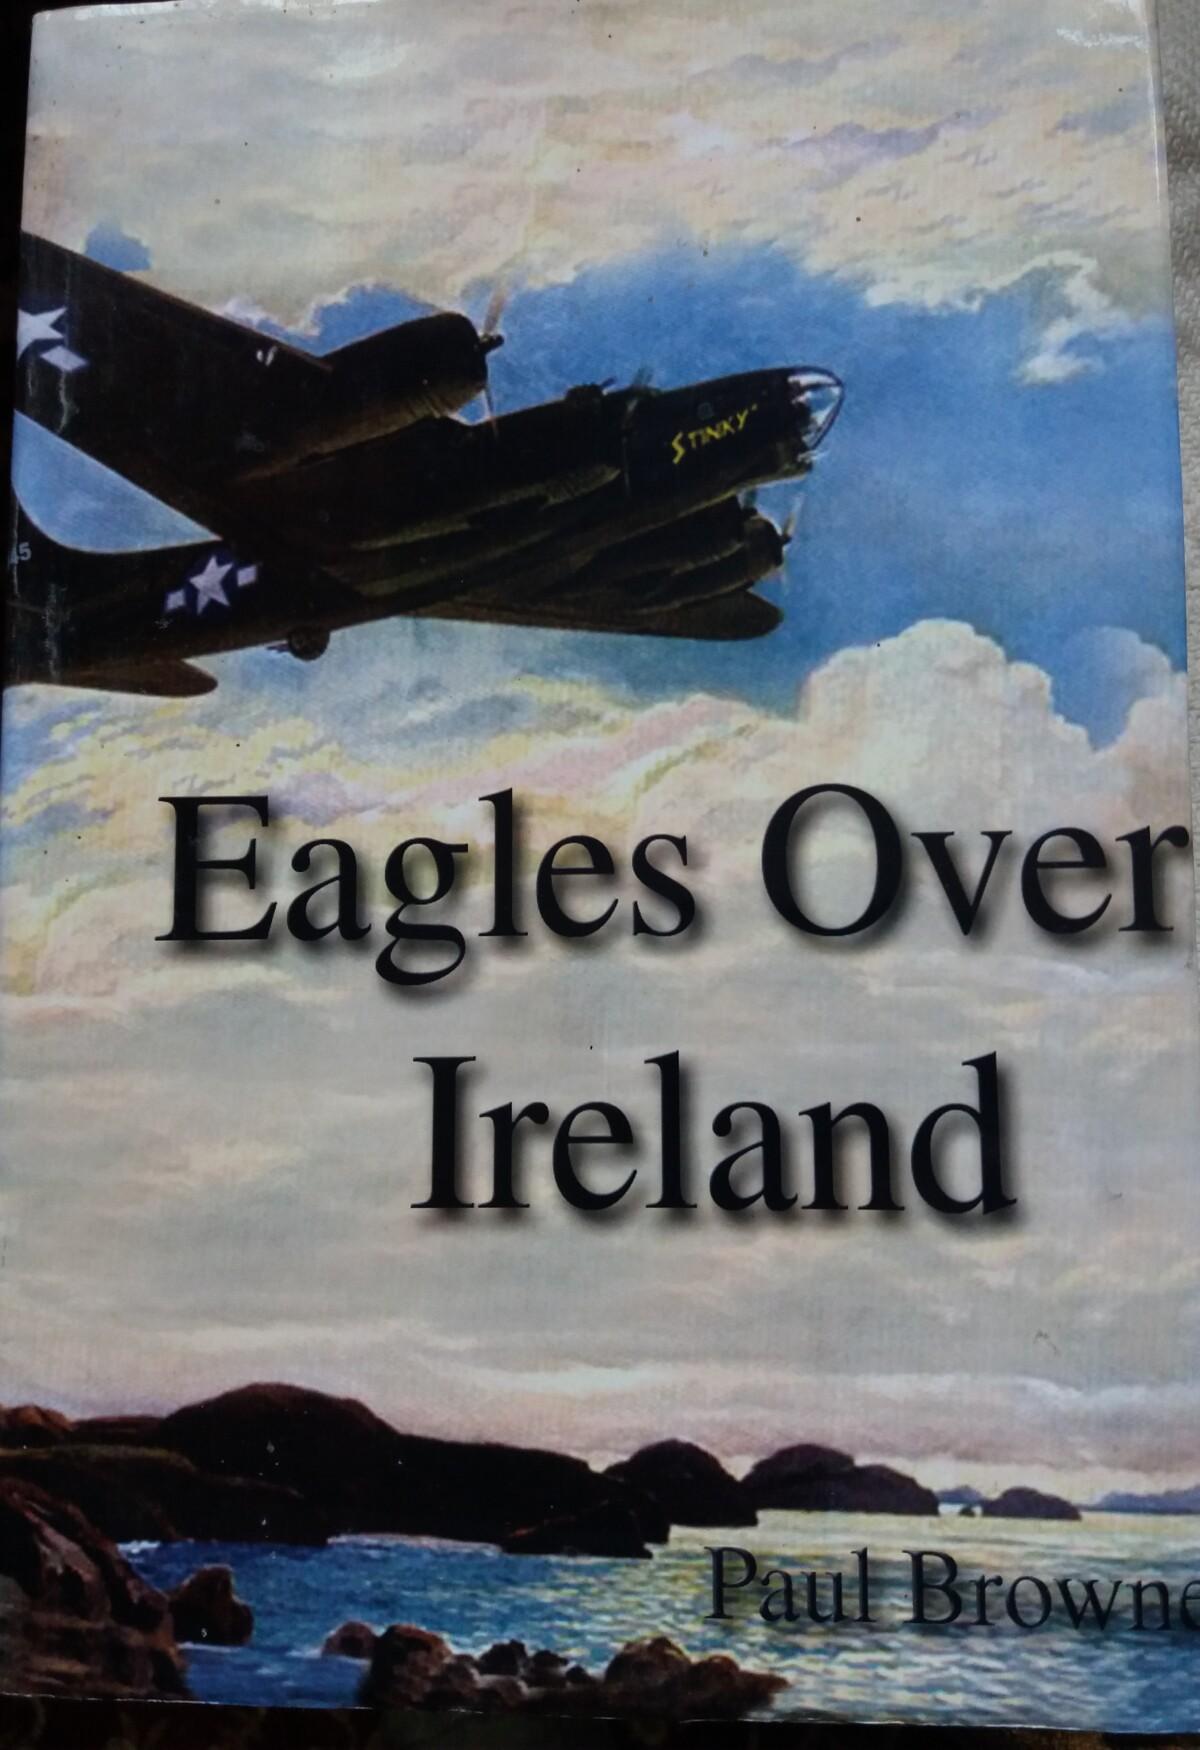 Eagles Over Ireland